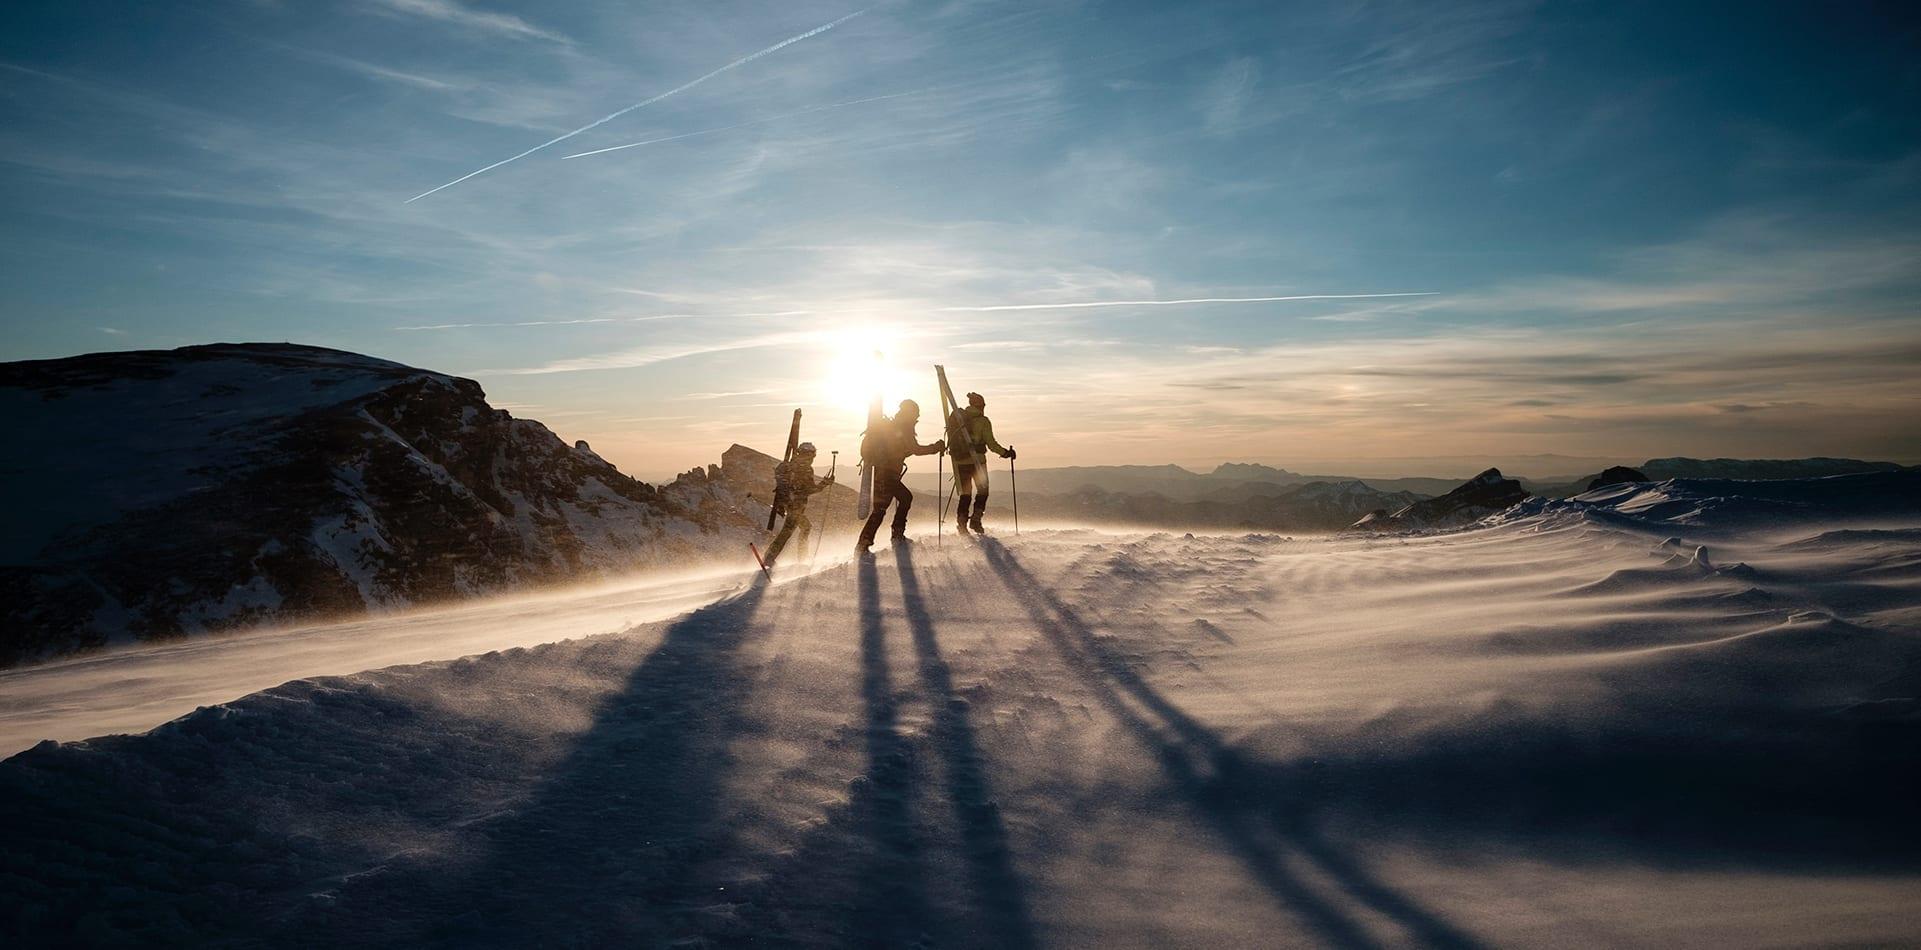 three people trekking